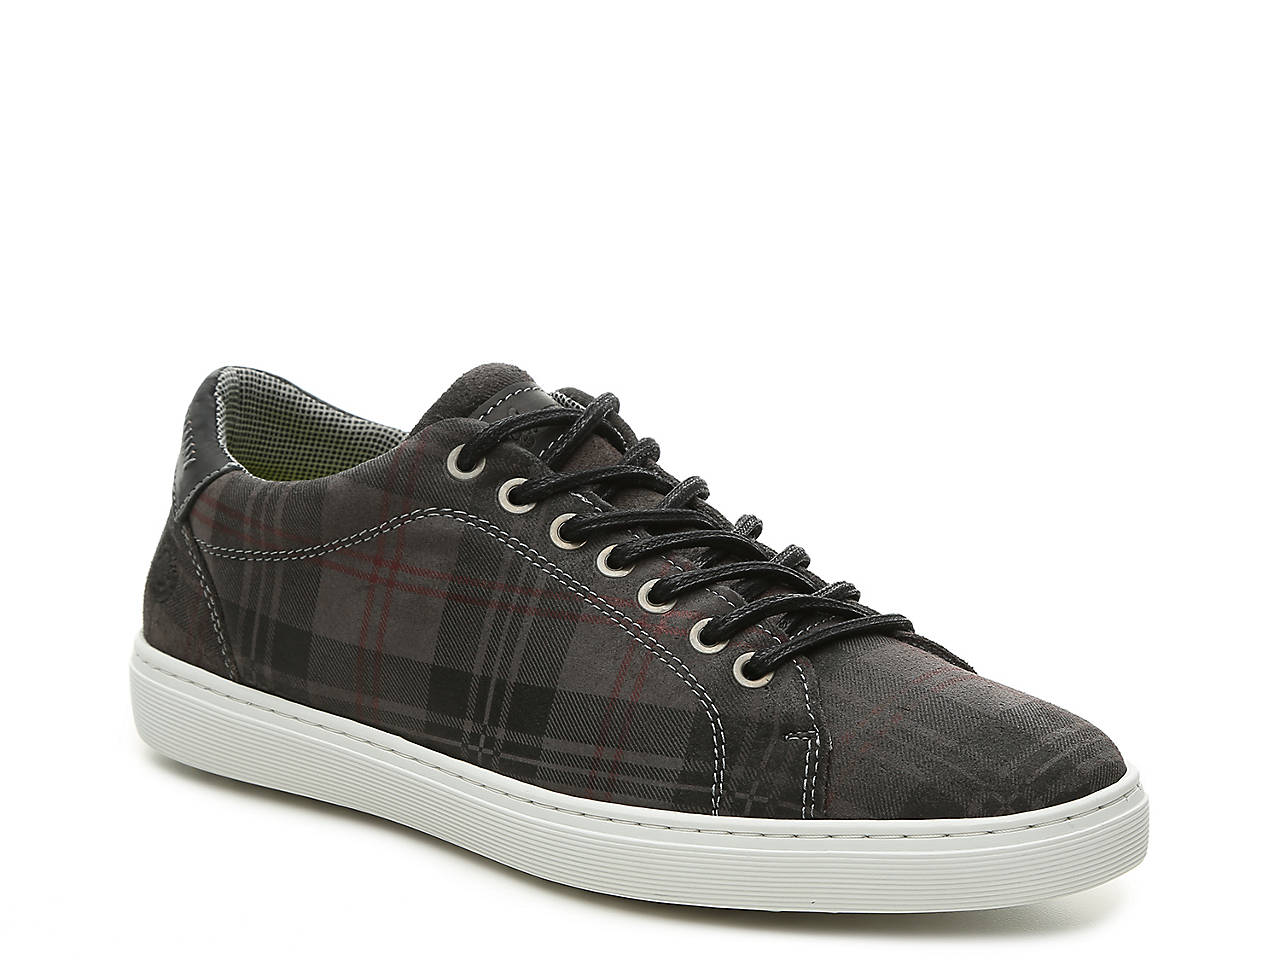 Bullboxer Rendyr Sneaker Men's Shoes DSW  DSW